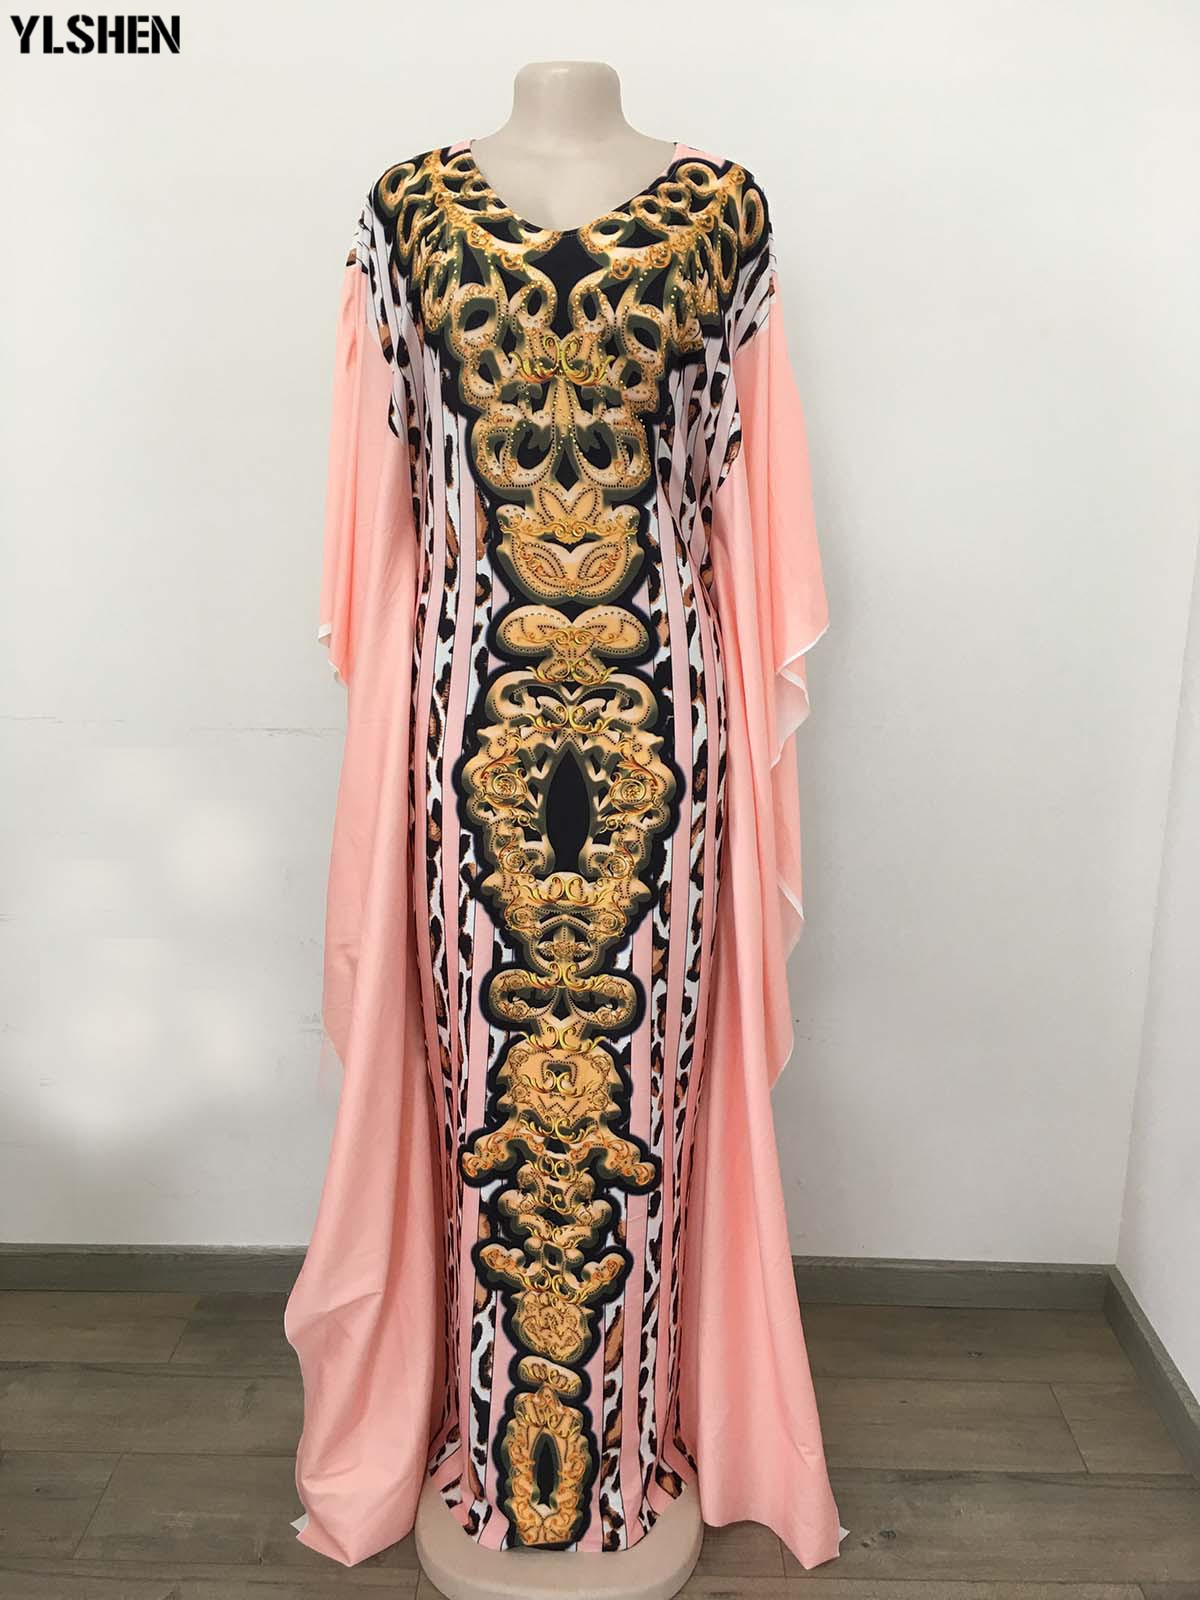 Dashiki African Dresses For Women Leopard Print African Clothes Plus Size Bazin Riche Slim Africa Dress Robe Vetement Femme 2019